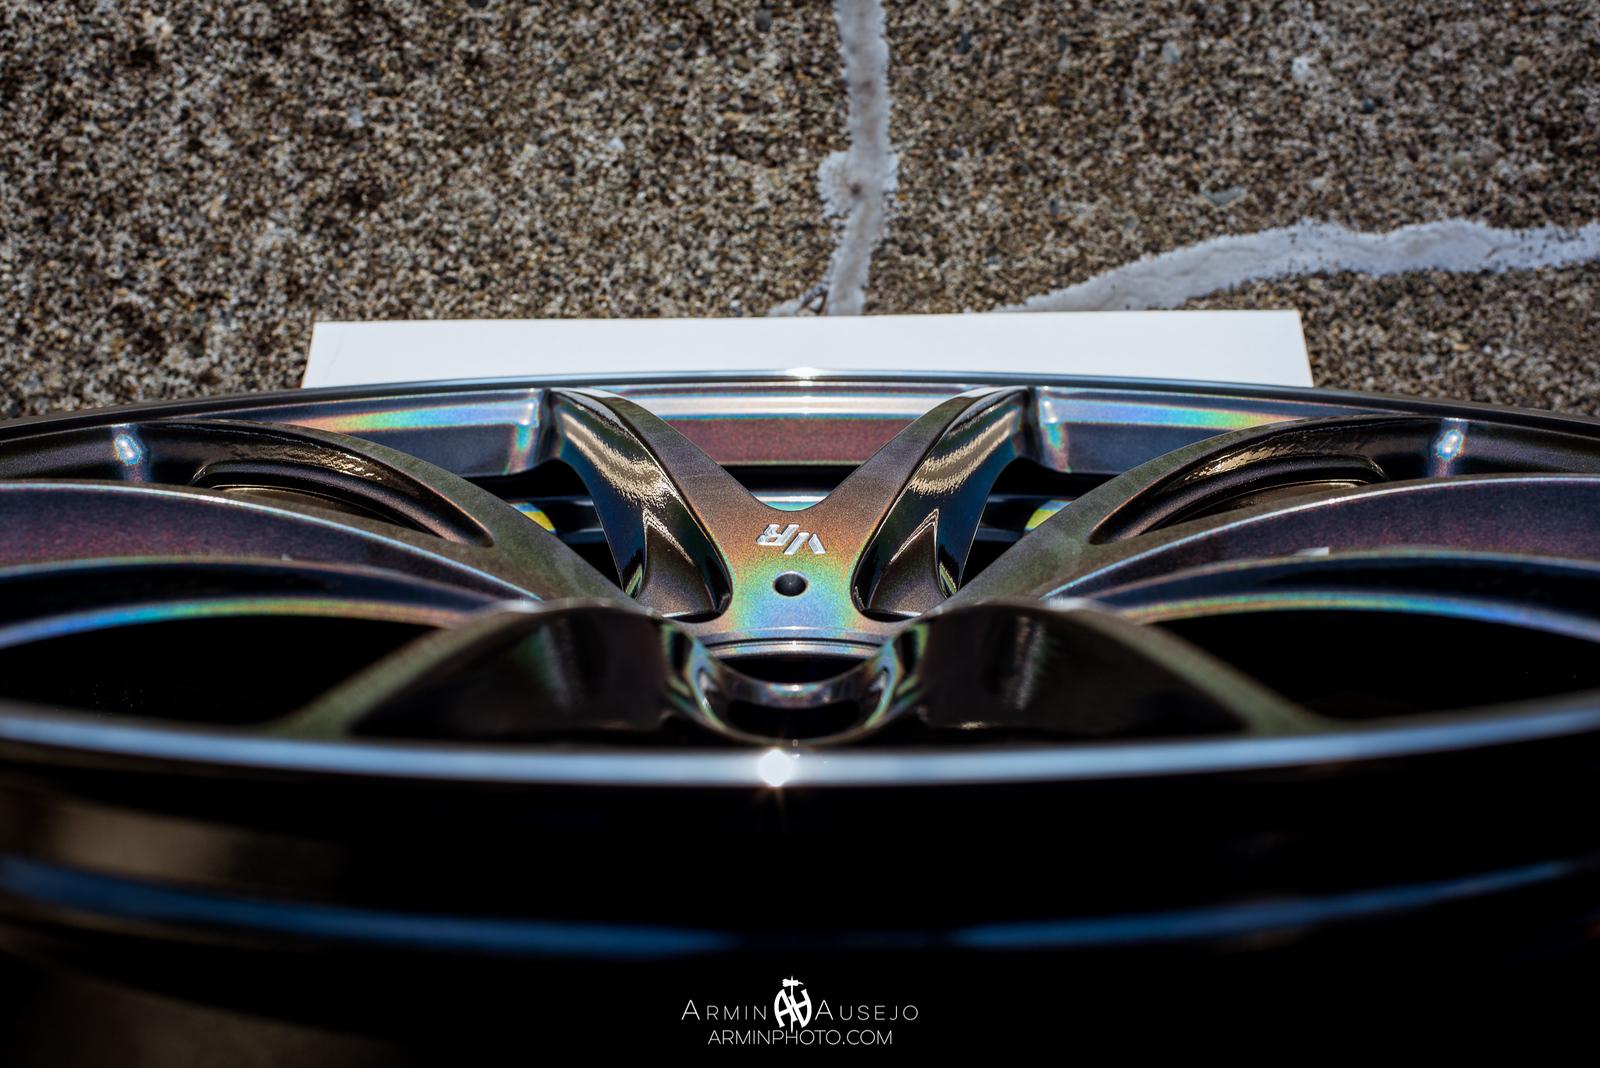 Volk Racing G25 in Dark Prism concave close-up